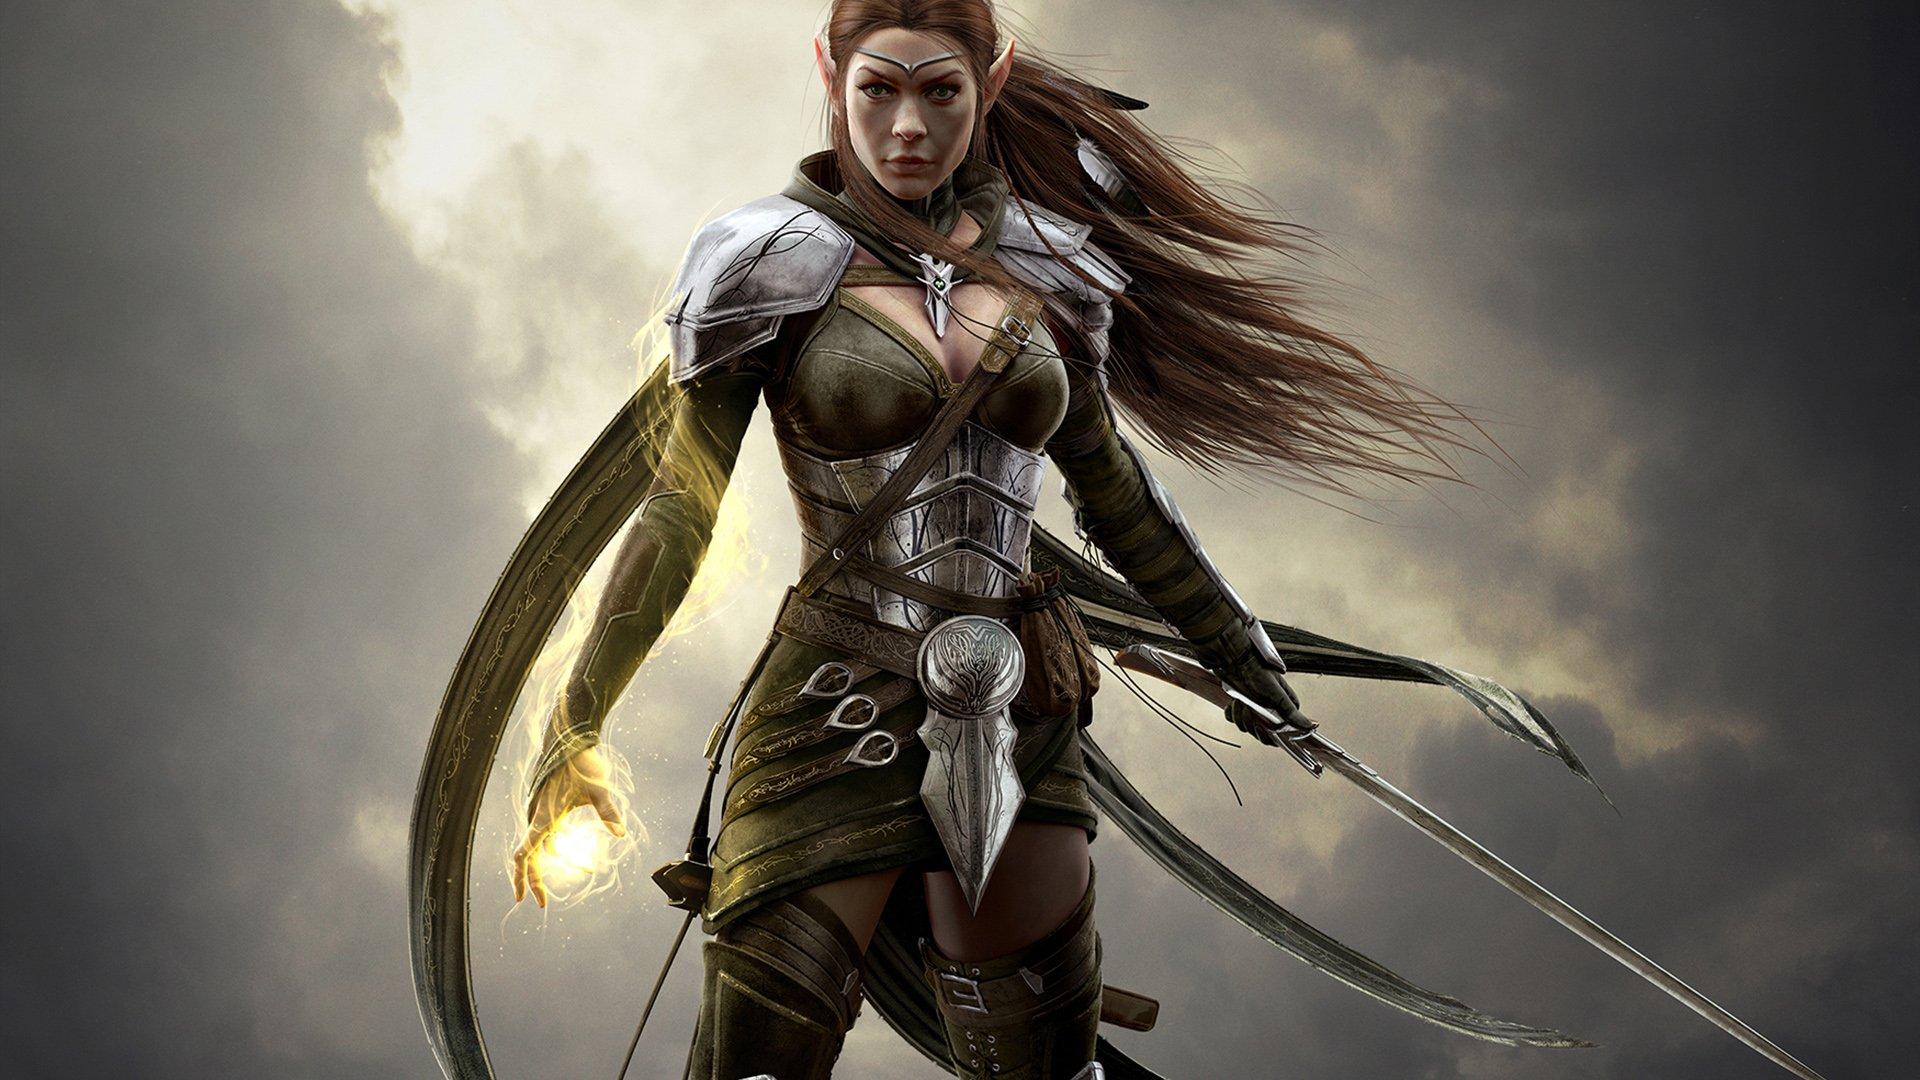 175 The Elder Scrolls Online Hd Wallpapers Background Images